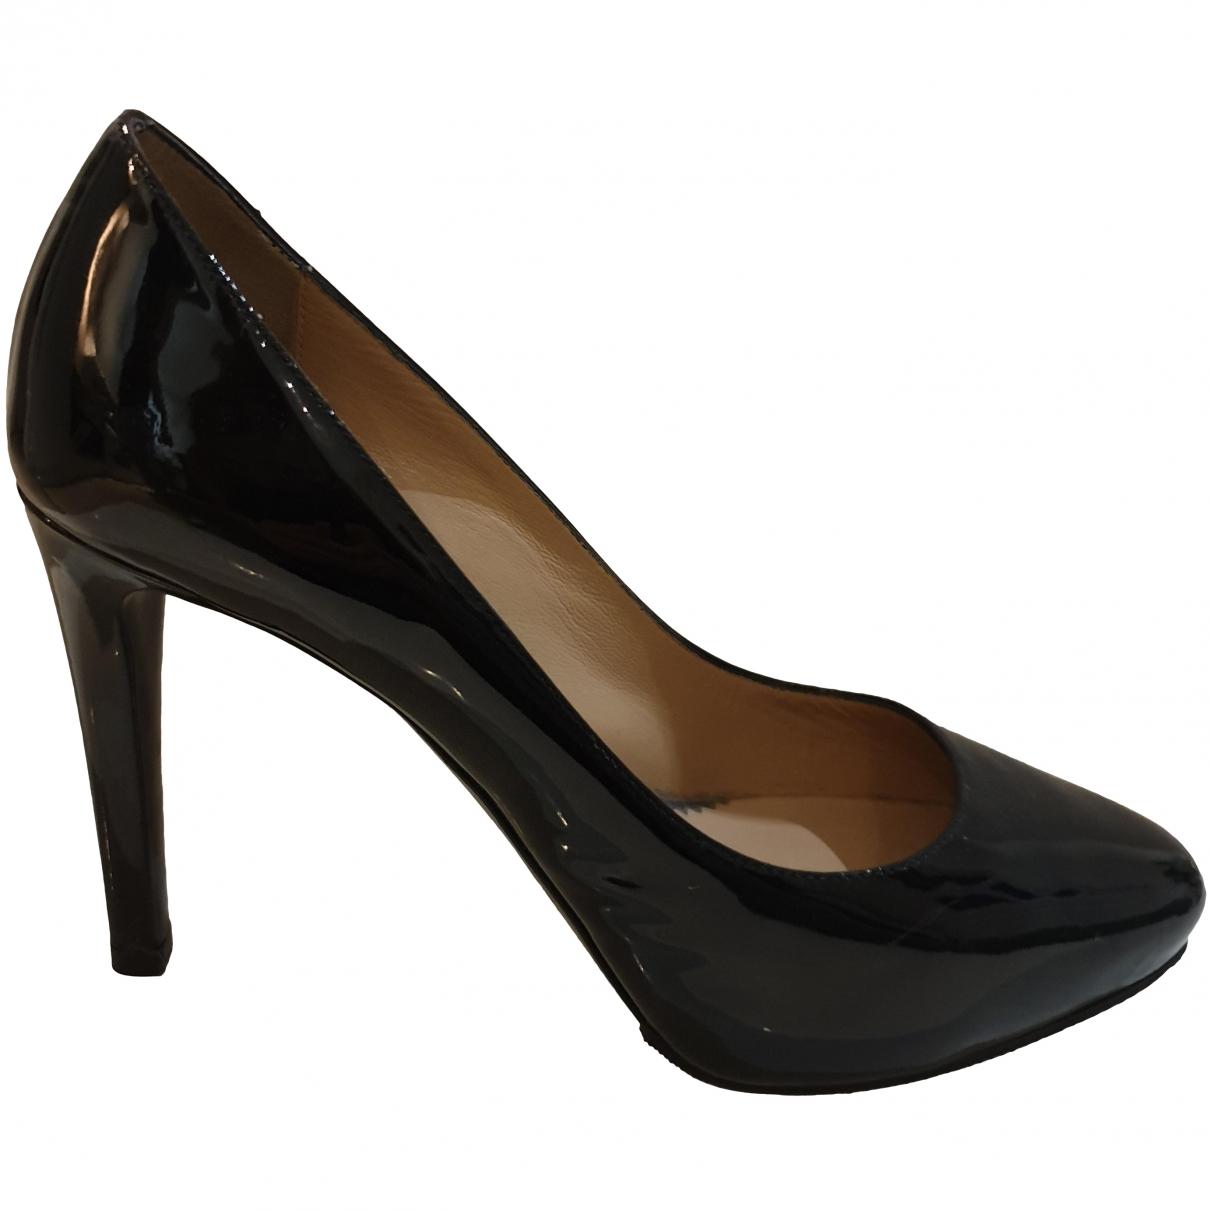 Emporio Armani \N Black Patent leather Heels for Women 36 EU